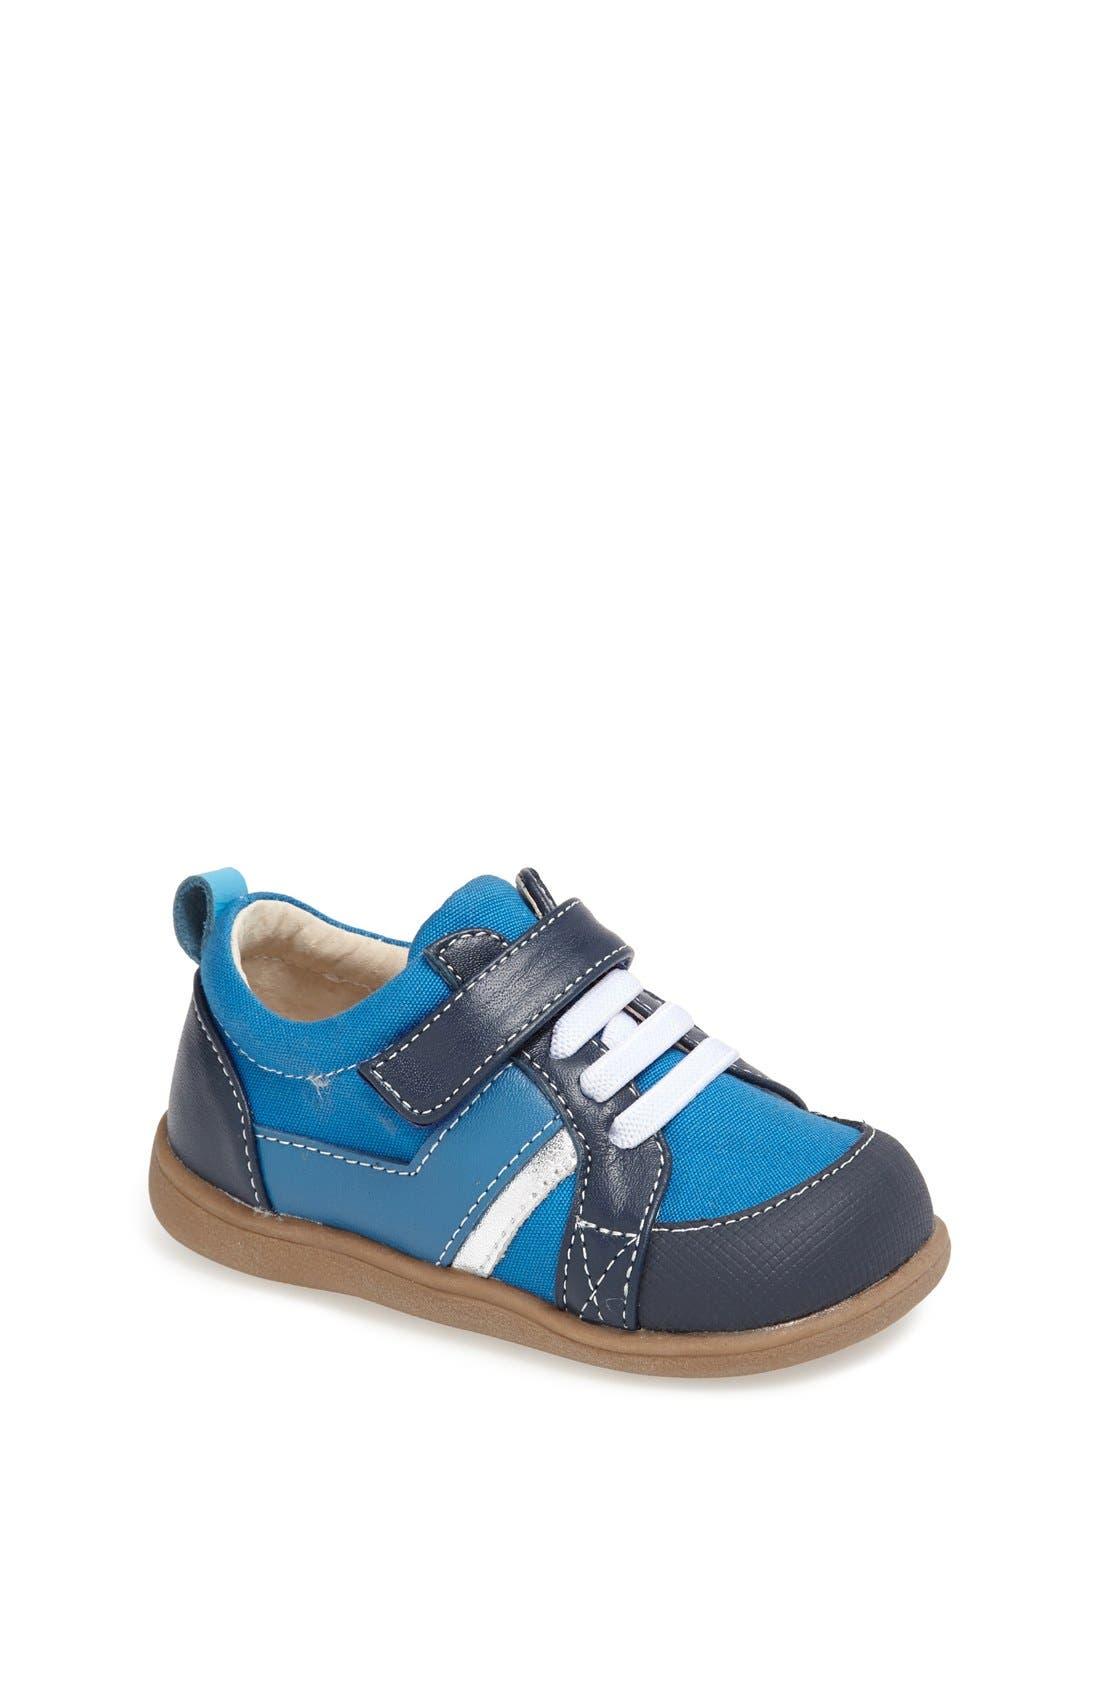 Main Image - See Kai Run 'Cash' Sneaker (Baby & Walker)